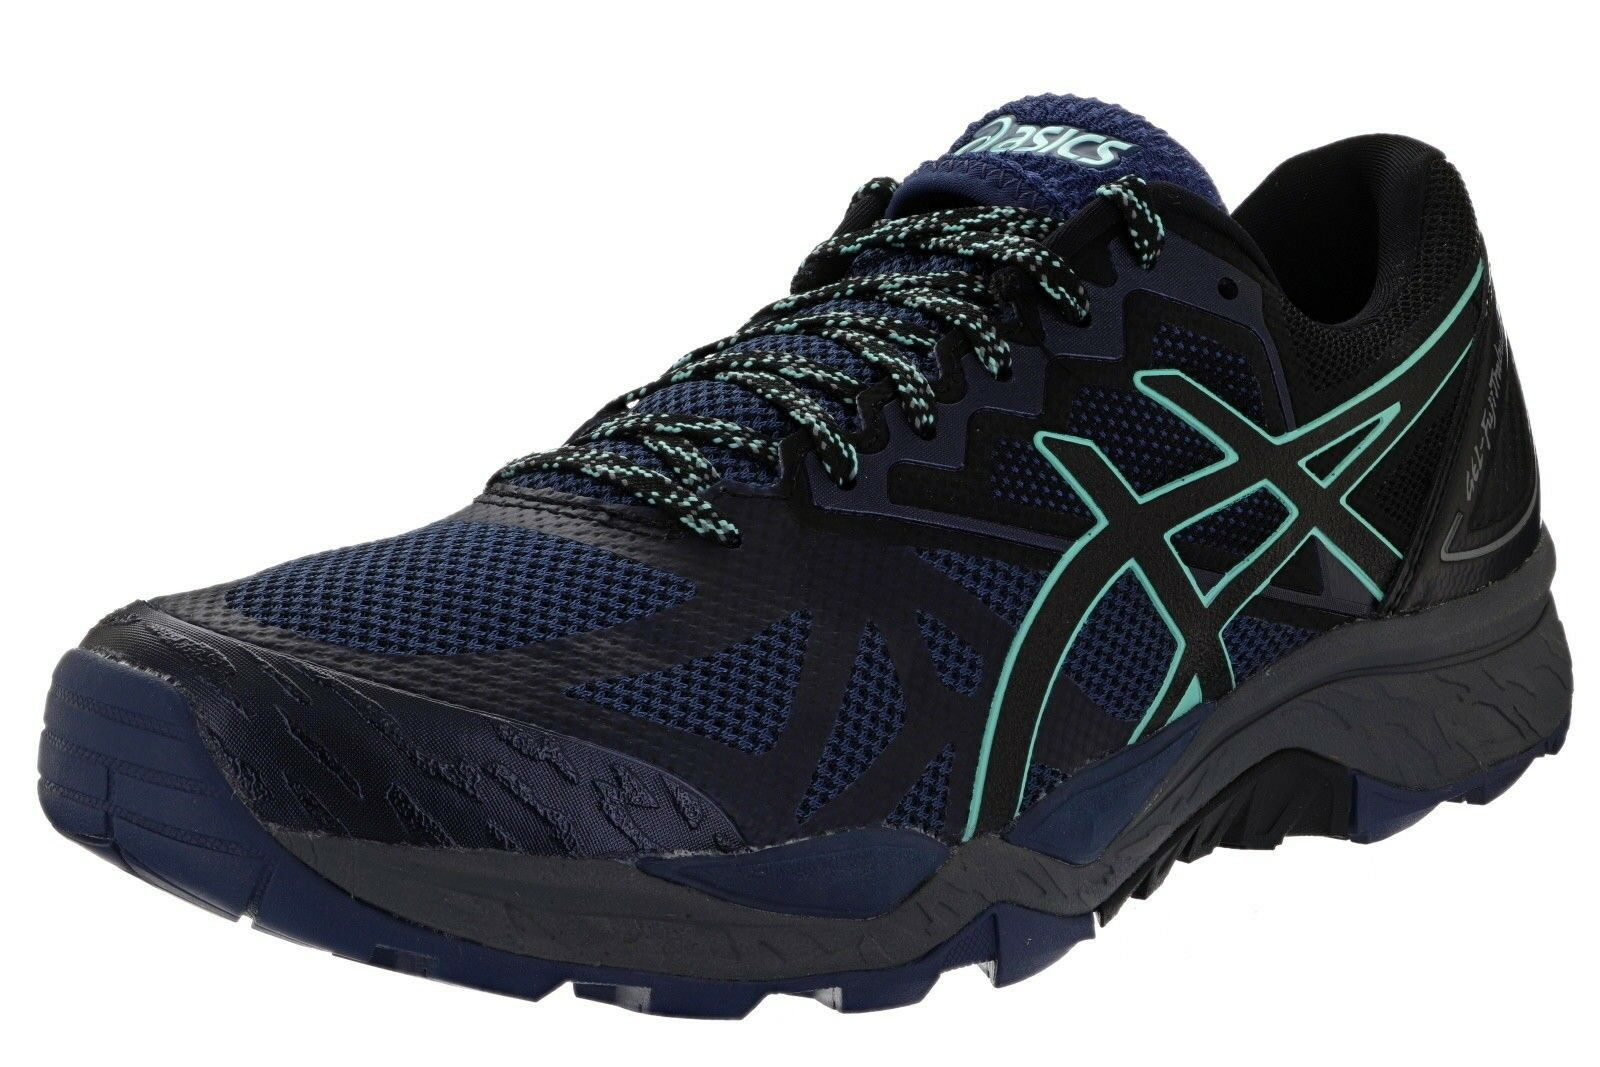 Asics Gel-FujiTrabuco 6 Damenschuhe Medium Width Trail Running Schuhes T7E9N-5090